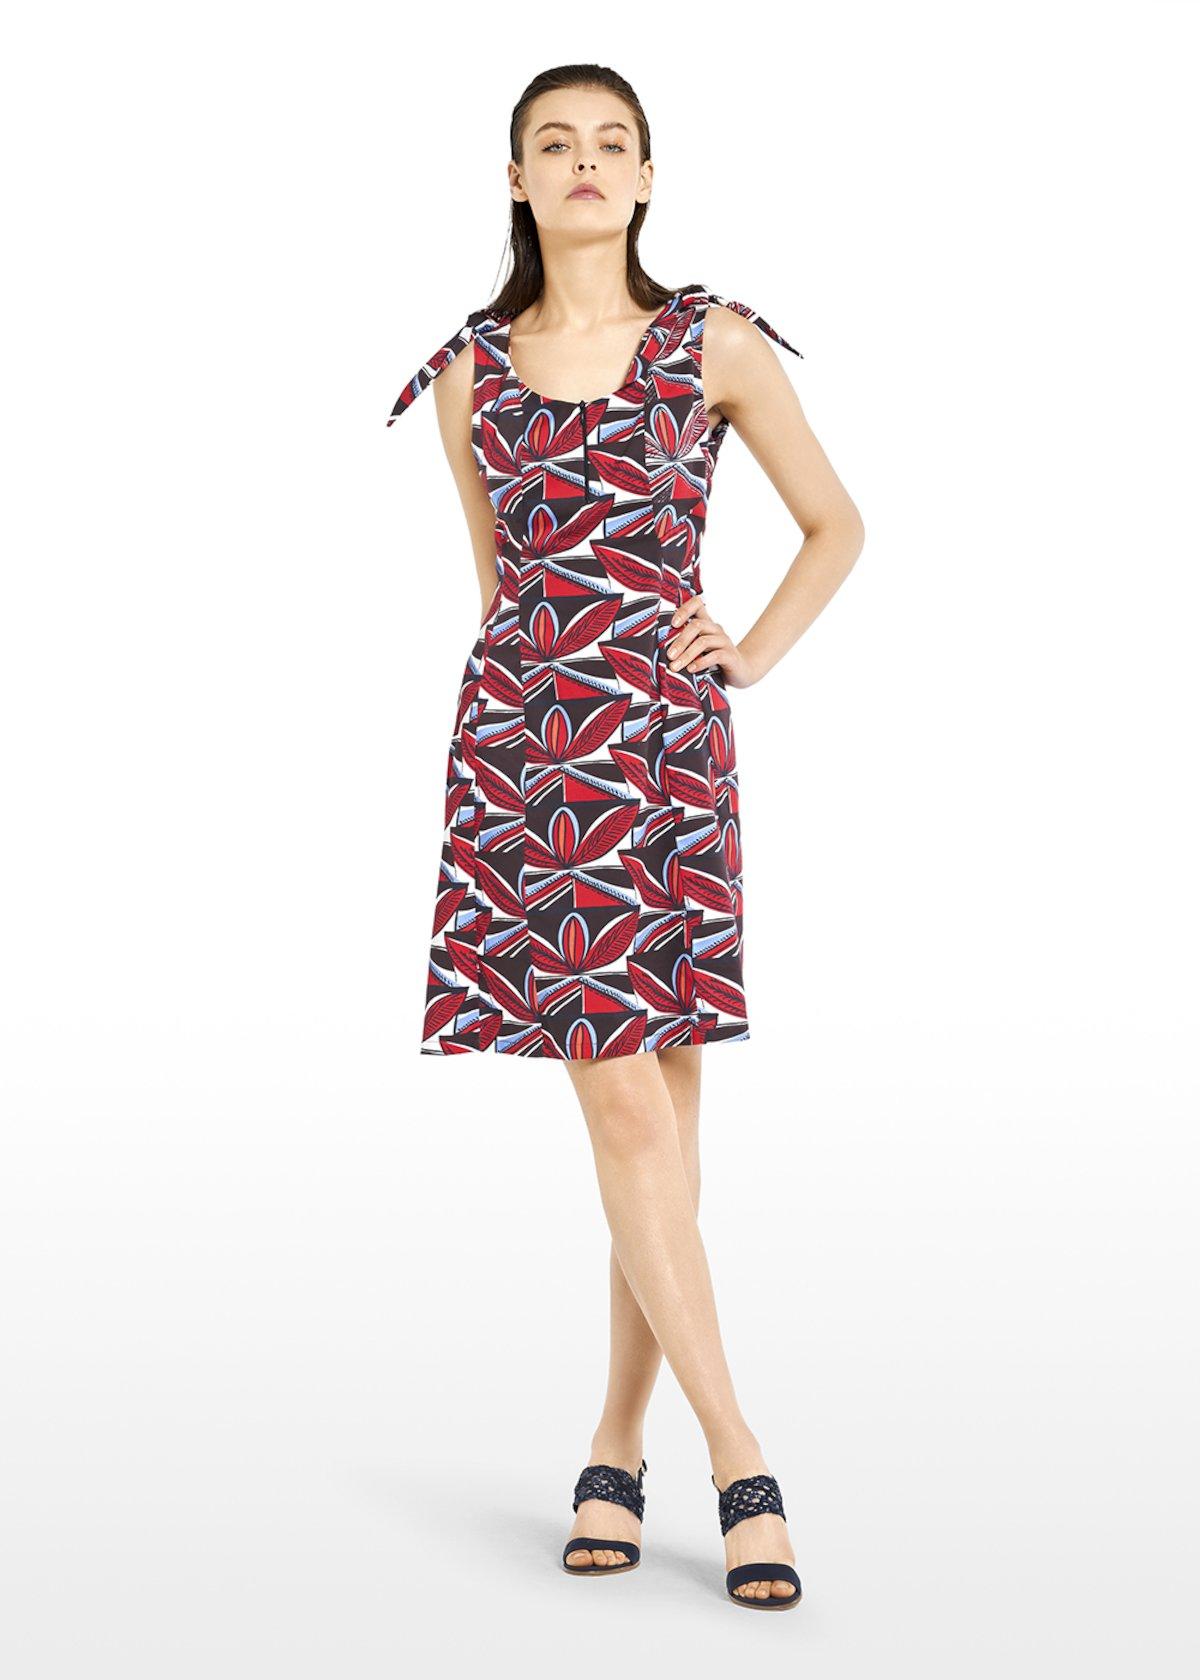 Alan dress in geometric fantasy cotton with knot detail - Tulipano / Crosta Fantasia - Woman